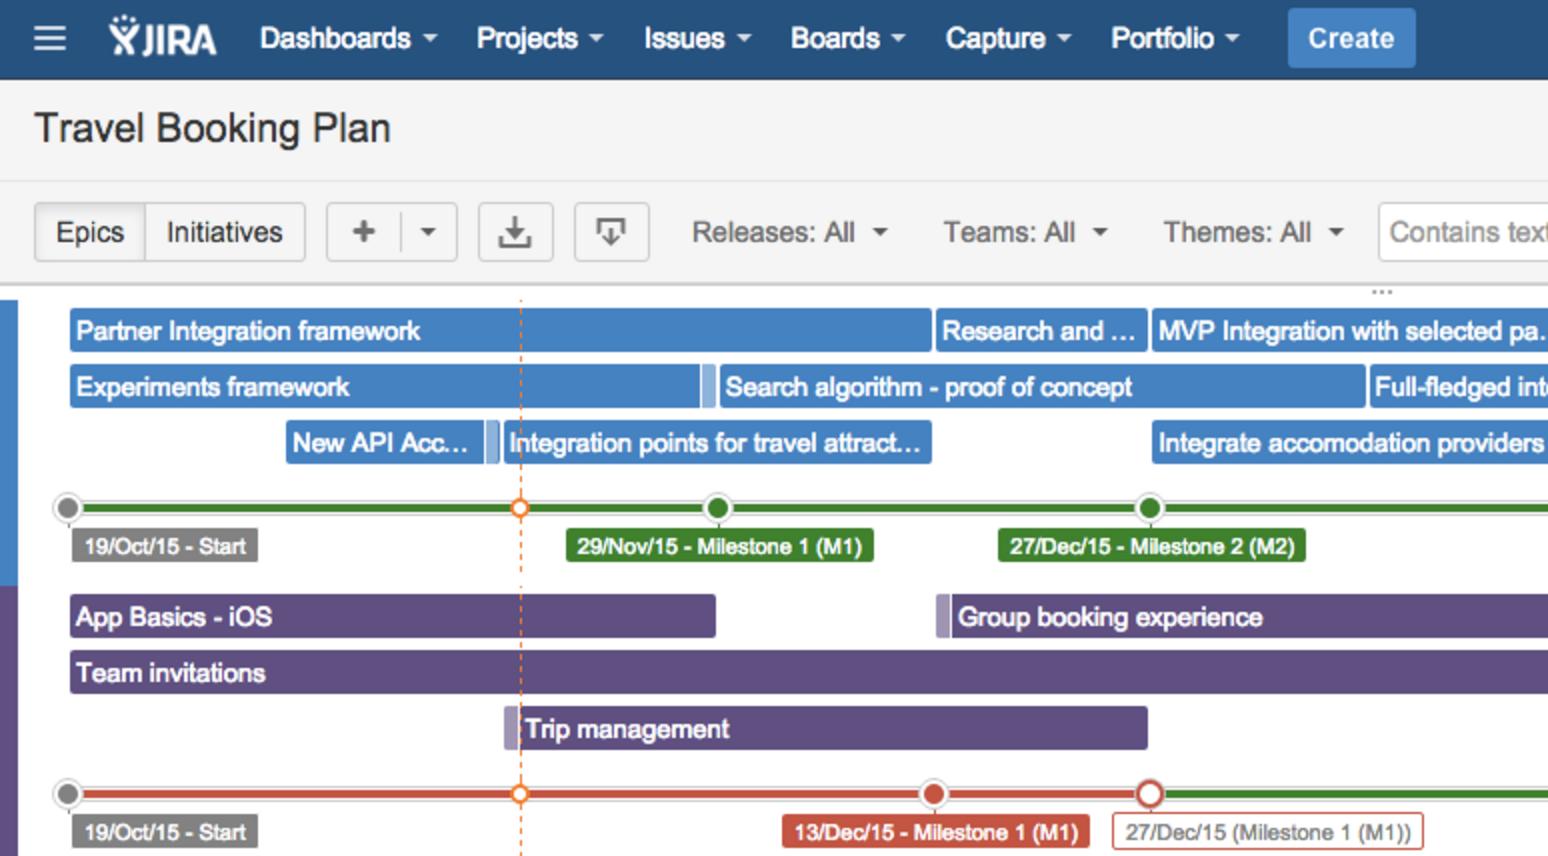 JIRA Portfolio Roadmap